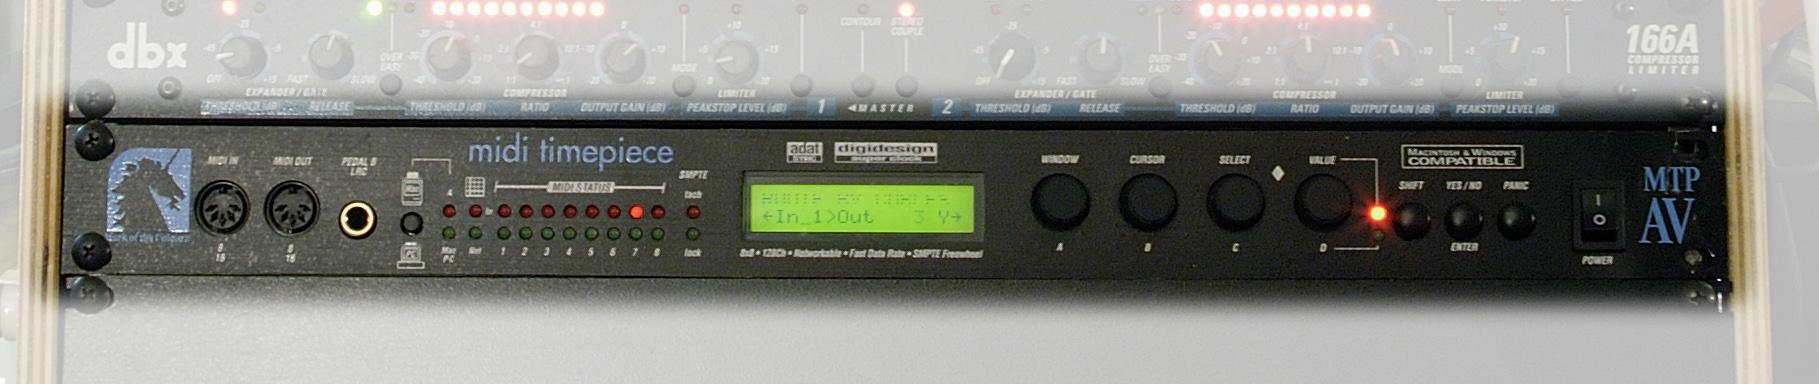 midi timepiece av 1996 mtp av 8x8 midi interface rh oldschooldaw com motu midi timepiece av manual download